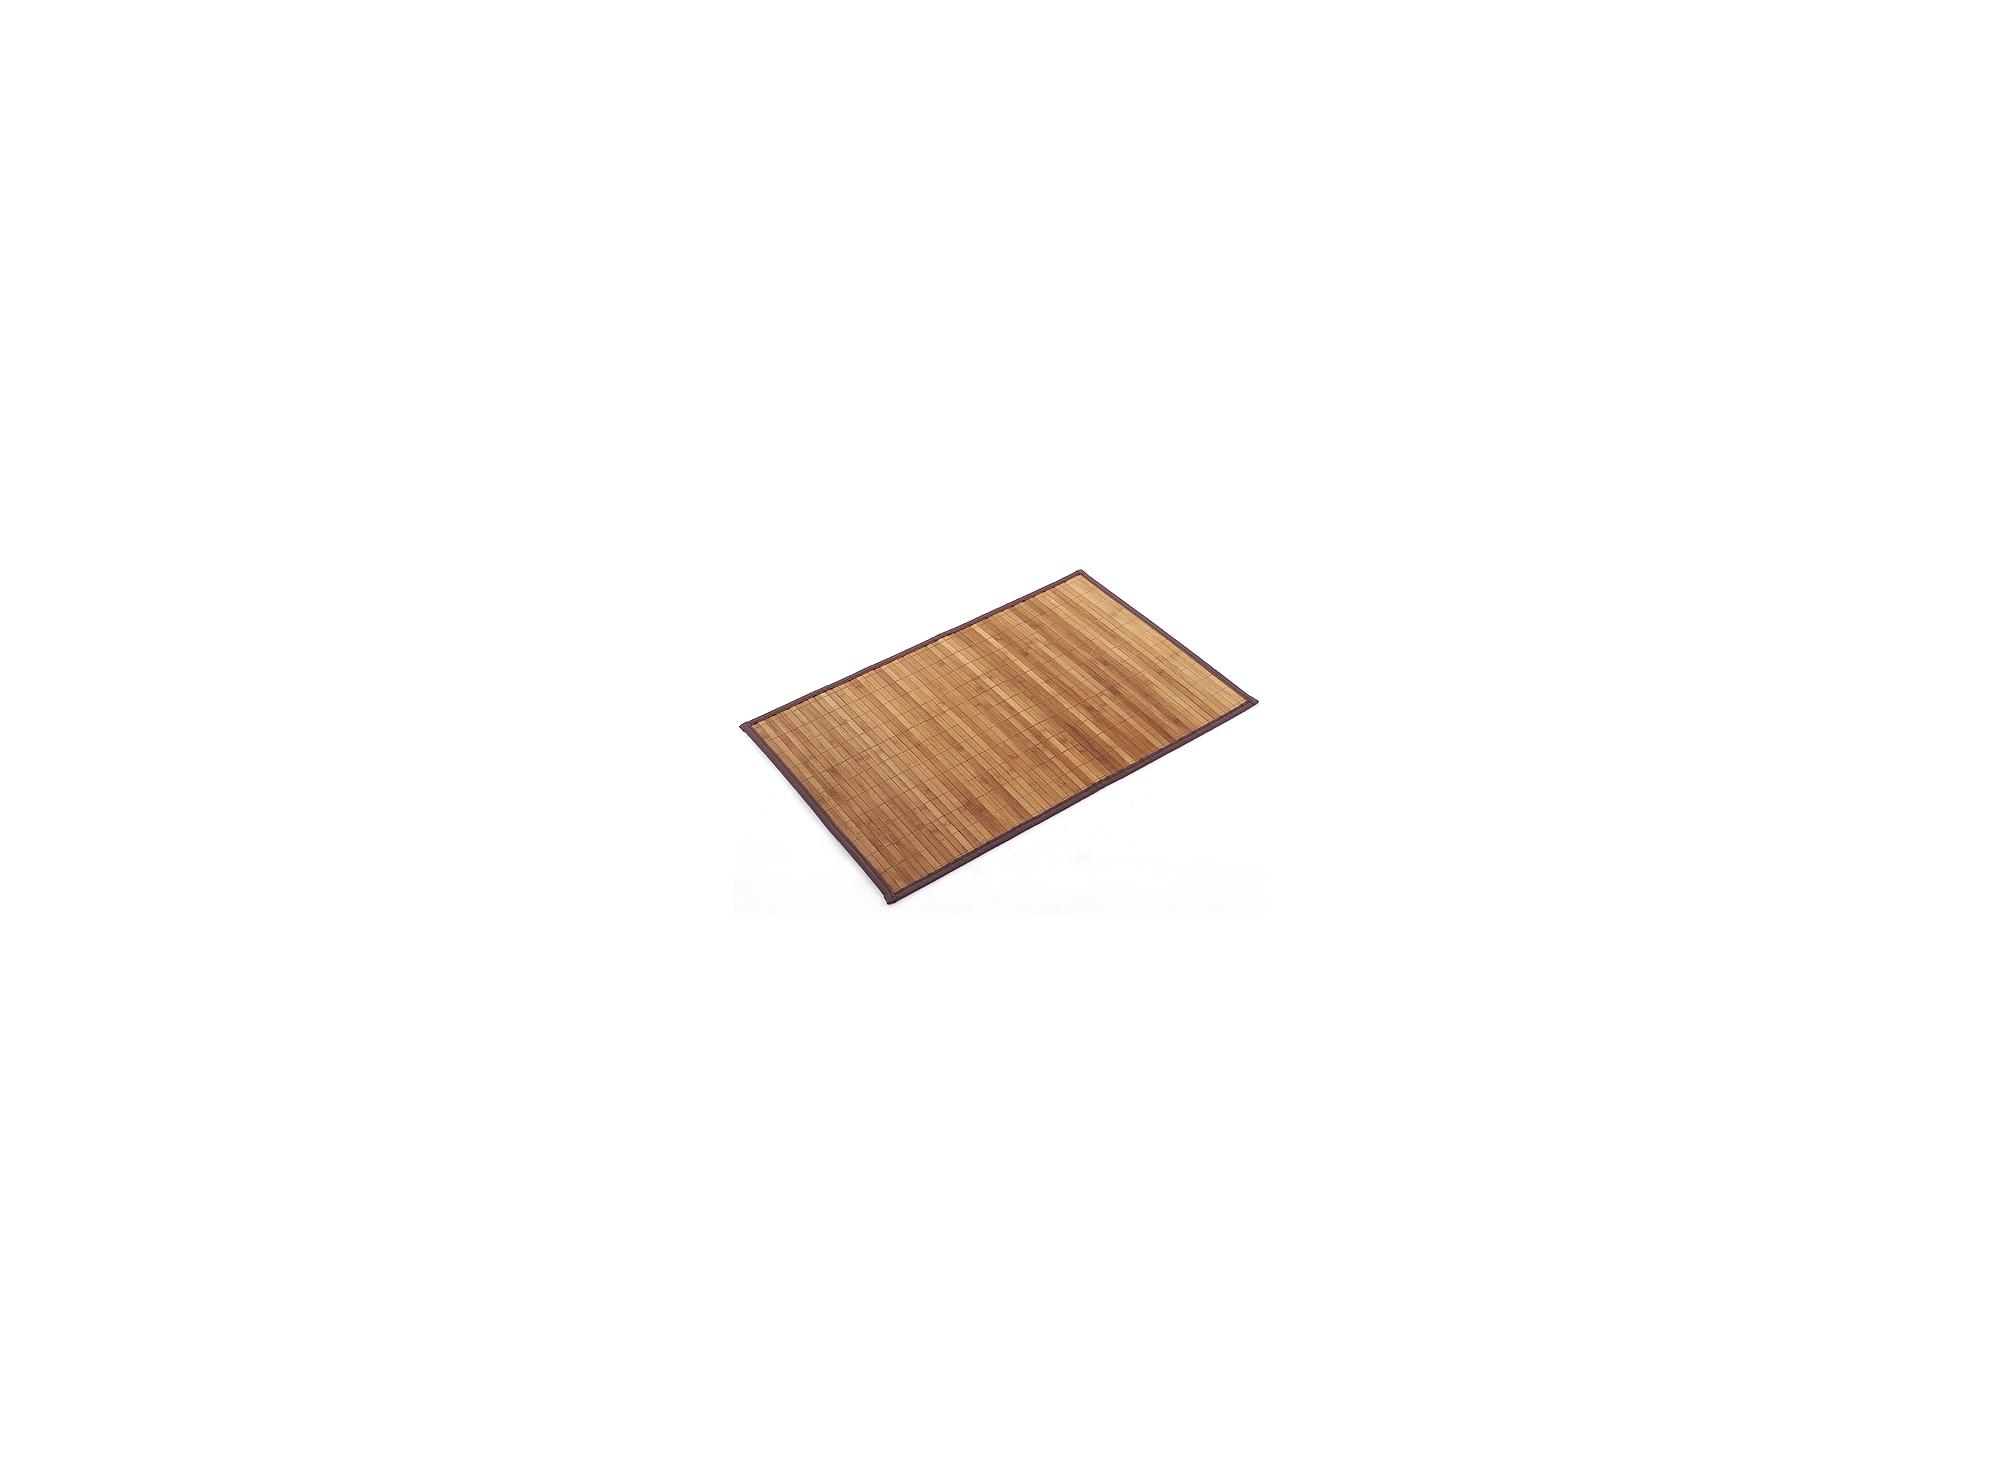 Tapis 60x90 en bambou large coloris brun sur mousse ganse 100% nylon ...